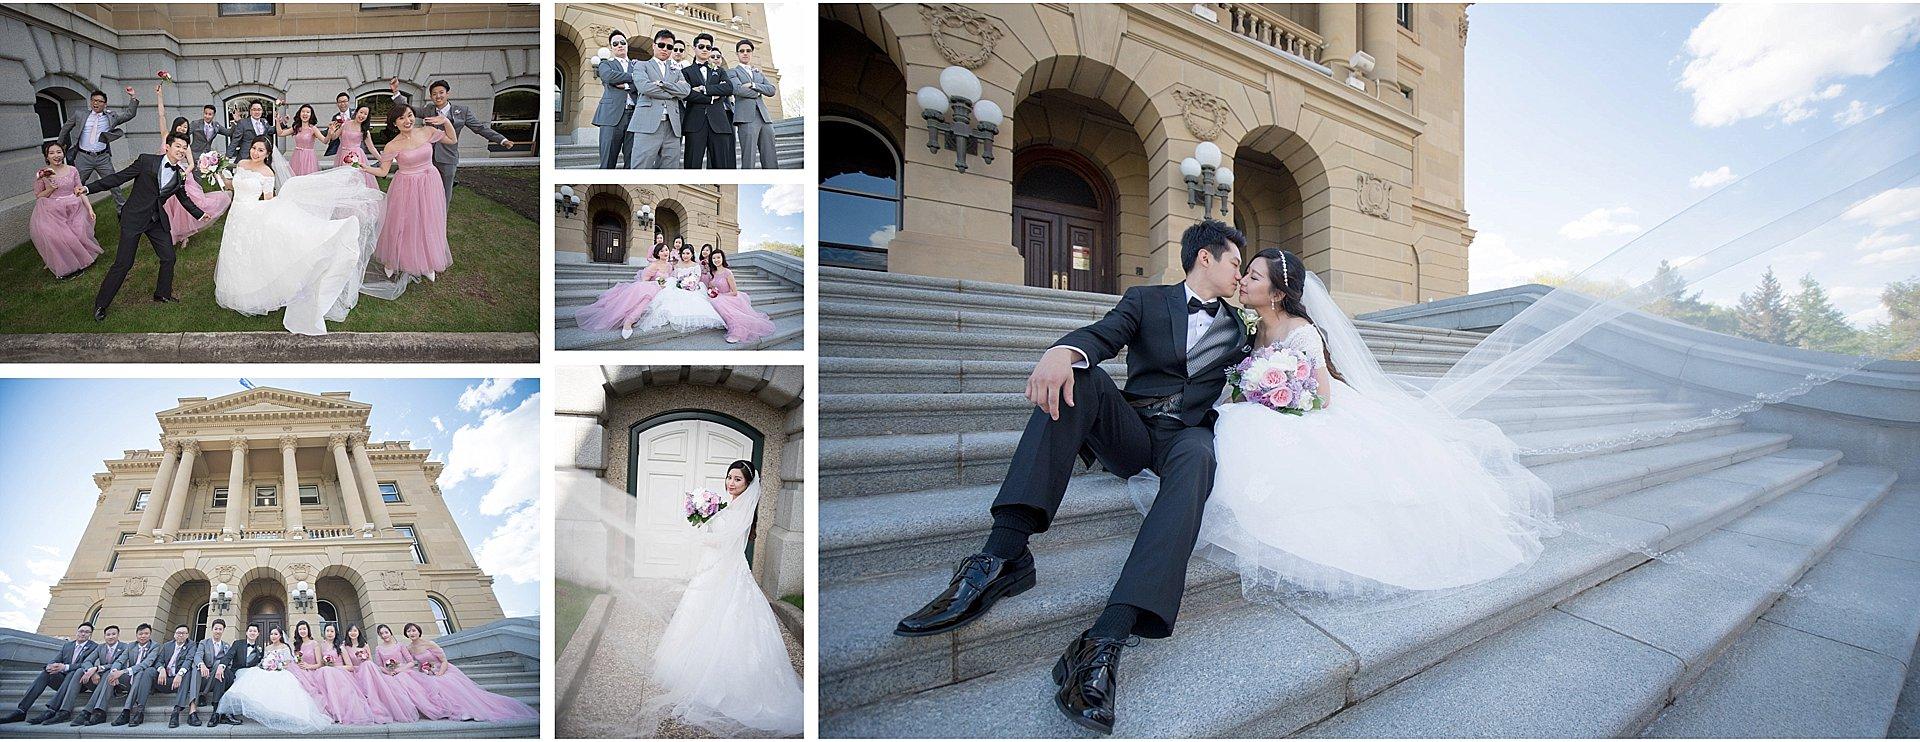 MB-First-Baptist-Church-Edmonton-Wedding-_0006